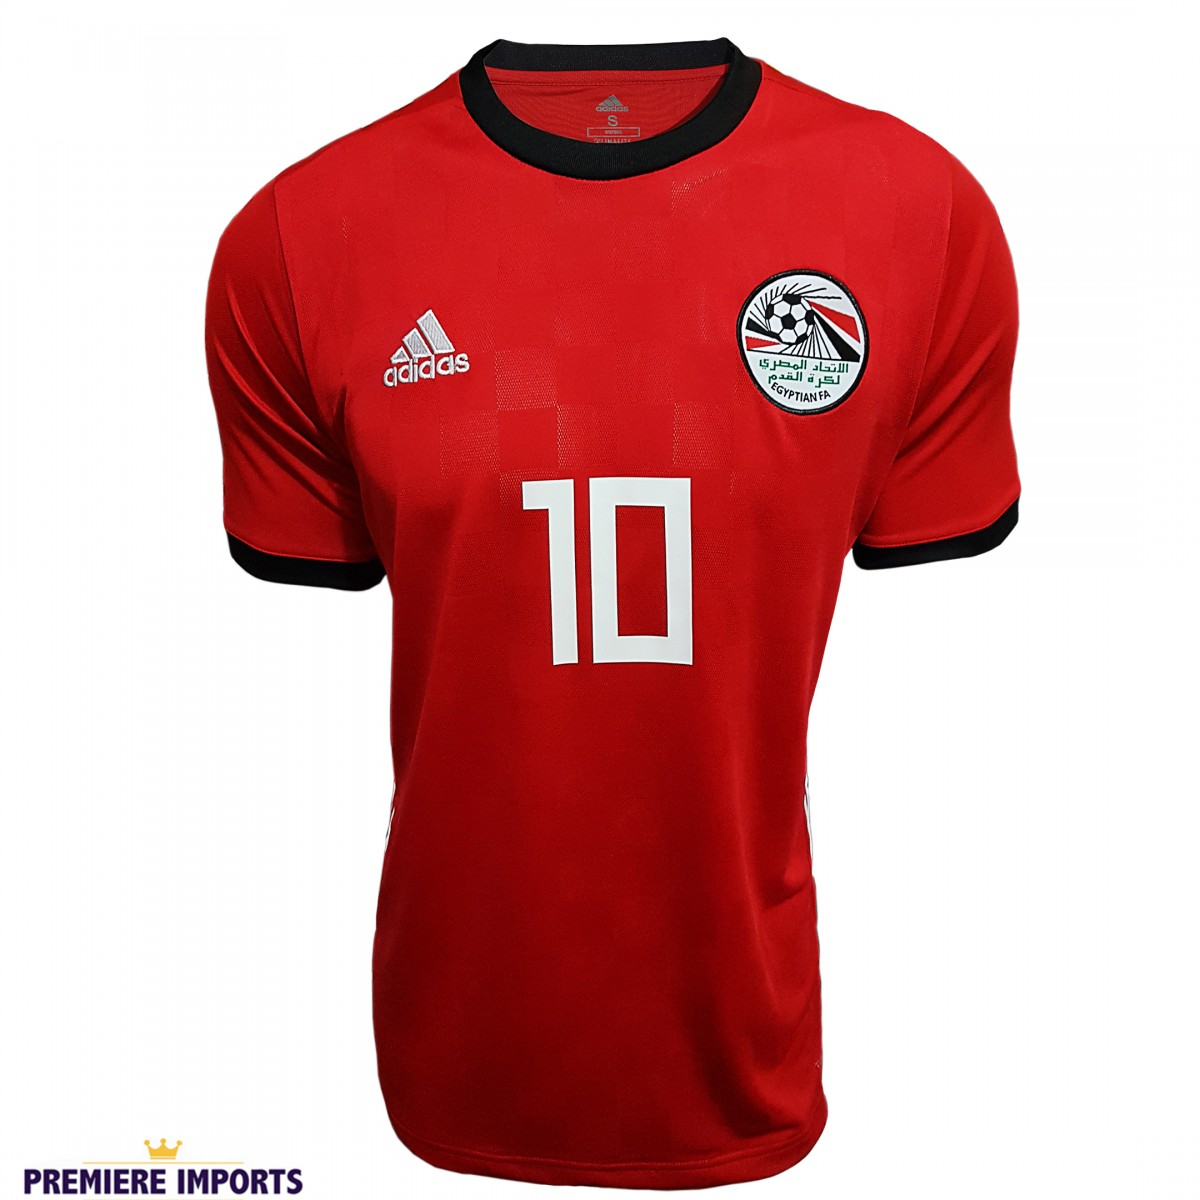 Foto 1 - Camisa Oficial Egito Home Salah 10 2018